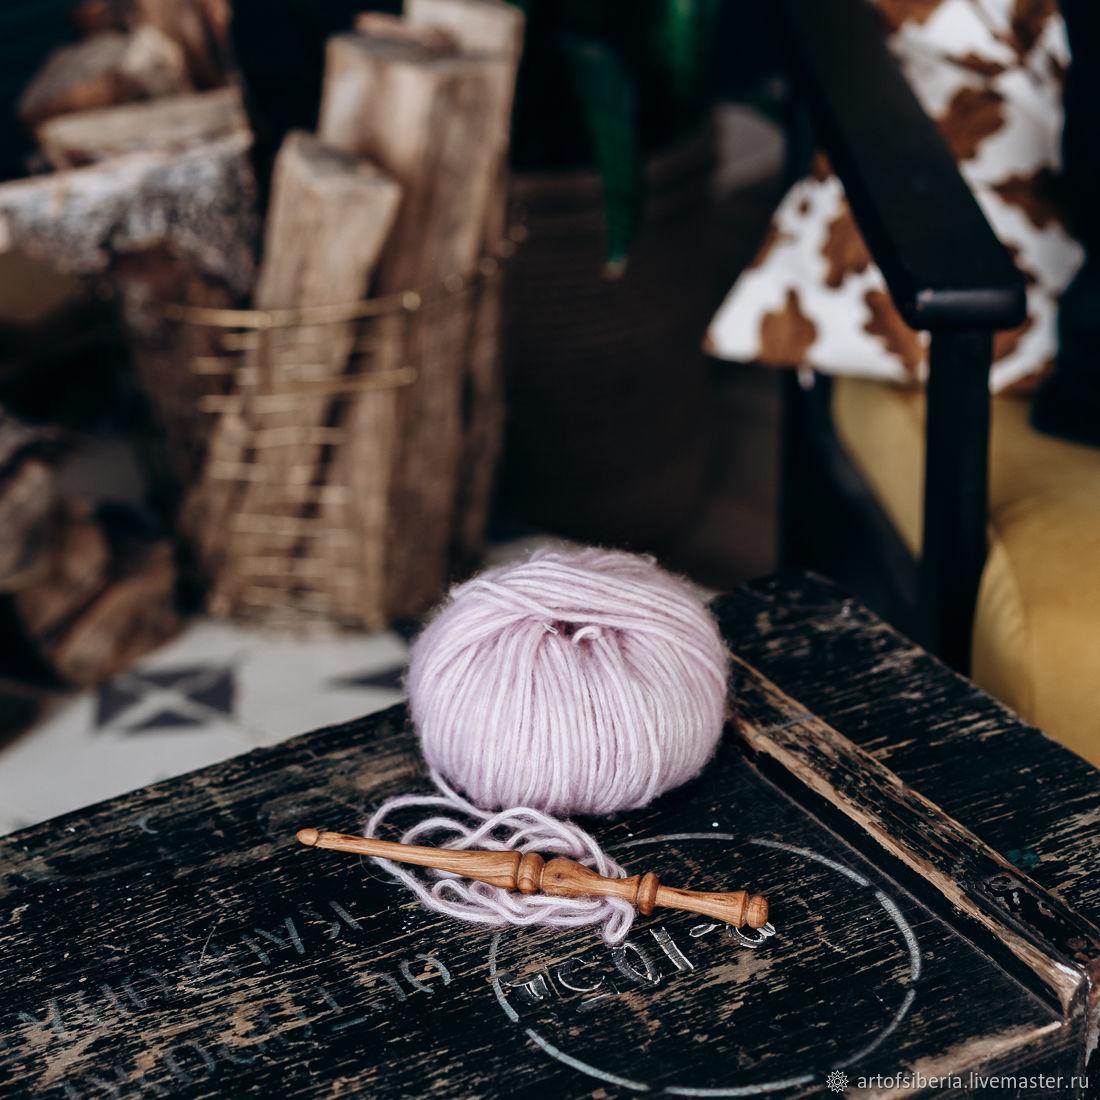 Wooden crochet hook 6mm (cherry) crochet hooks K148, Crochet Hooks, Novokuznetsk,  Фото №1